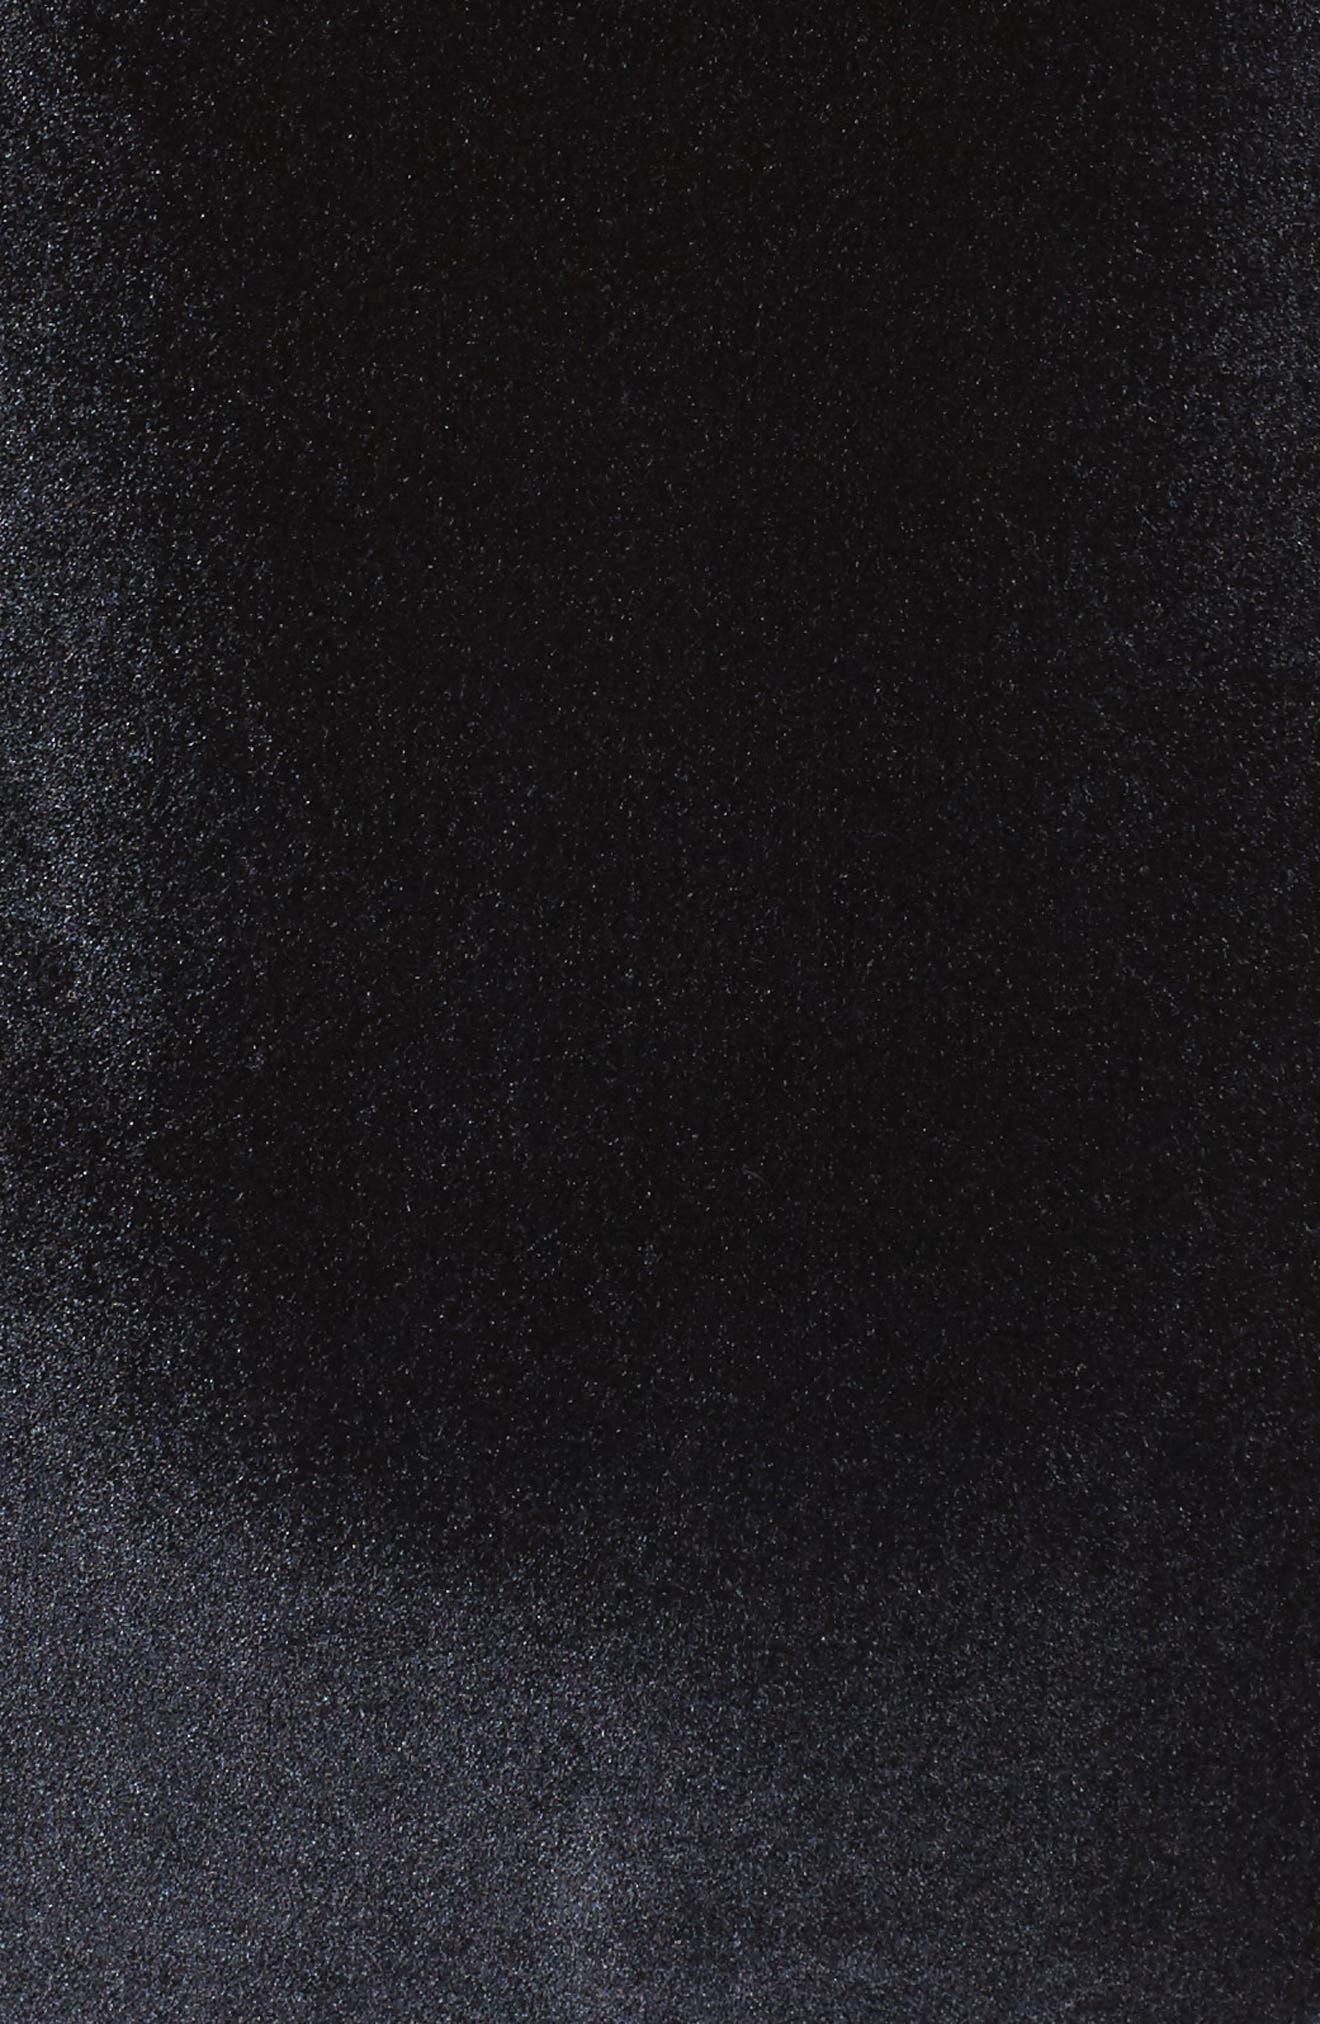 Velveteen Underground Off the Shoulder One-Piece Swimsuit,                             Alternate thumbnail 5, color,                             Black